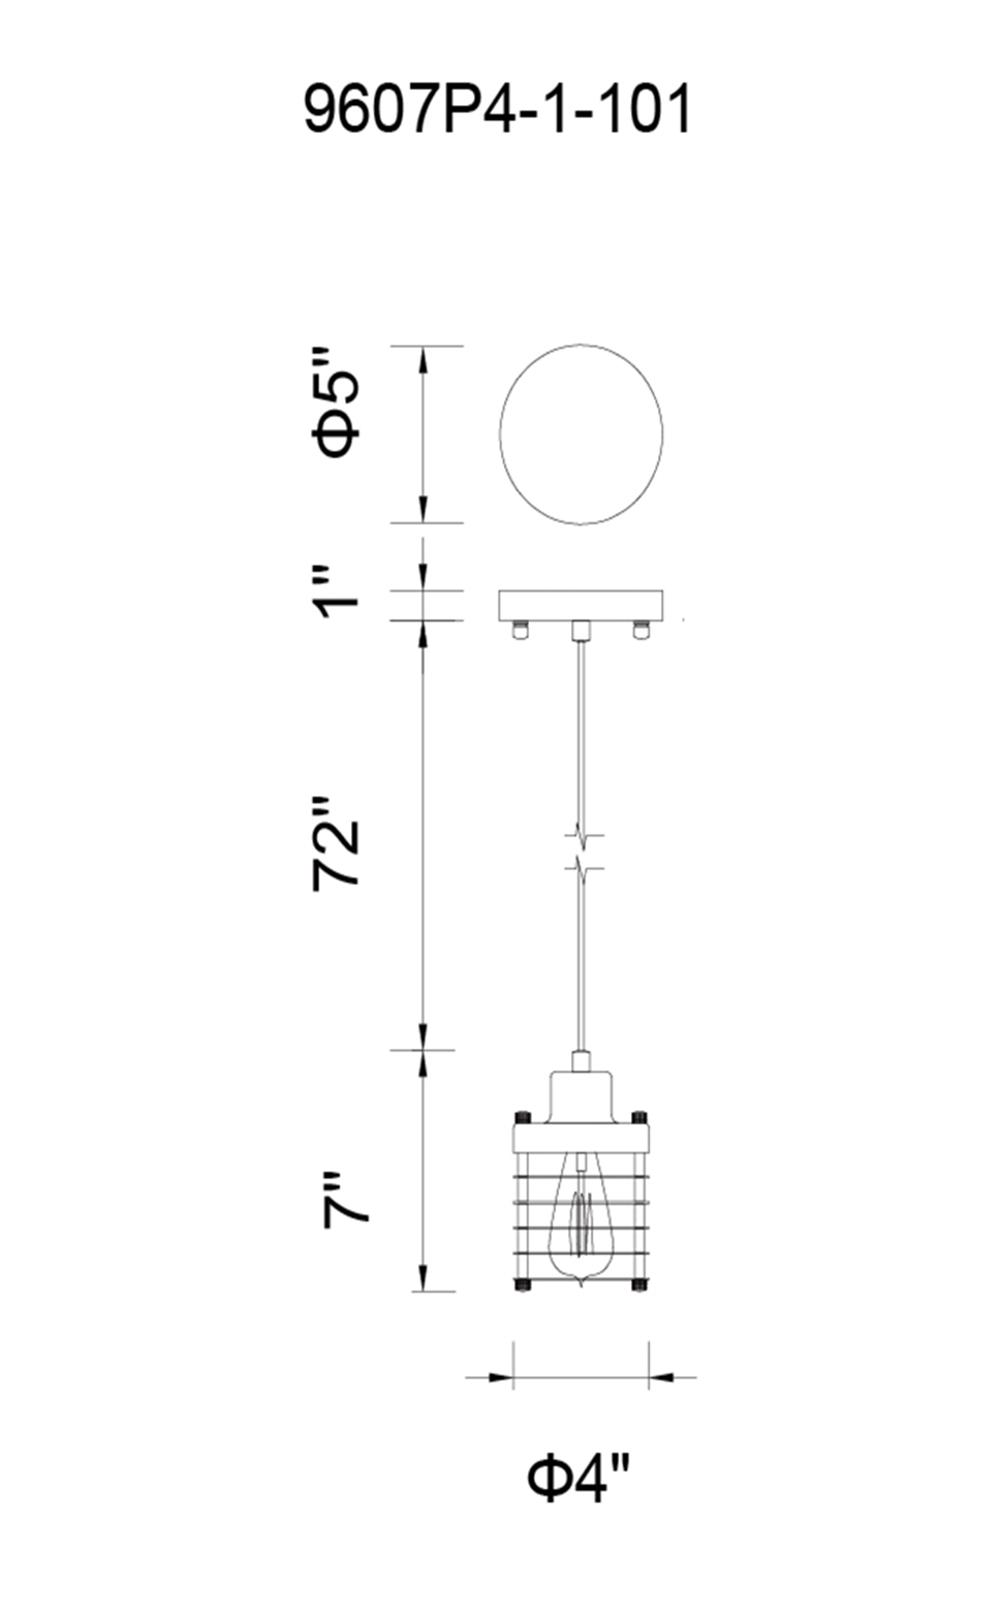 CWI Lighting Bray 1 Light Down Mini Pendant With Black Finish Model: 9607P4-1-101 Line Drawing